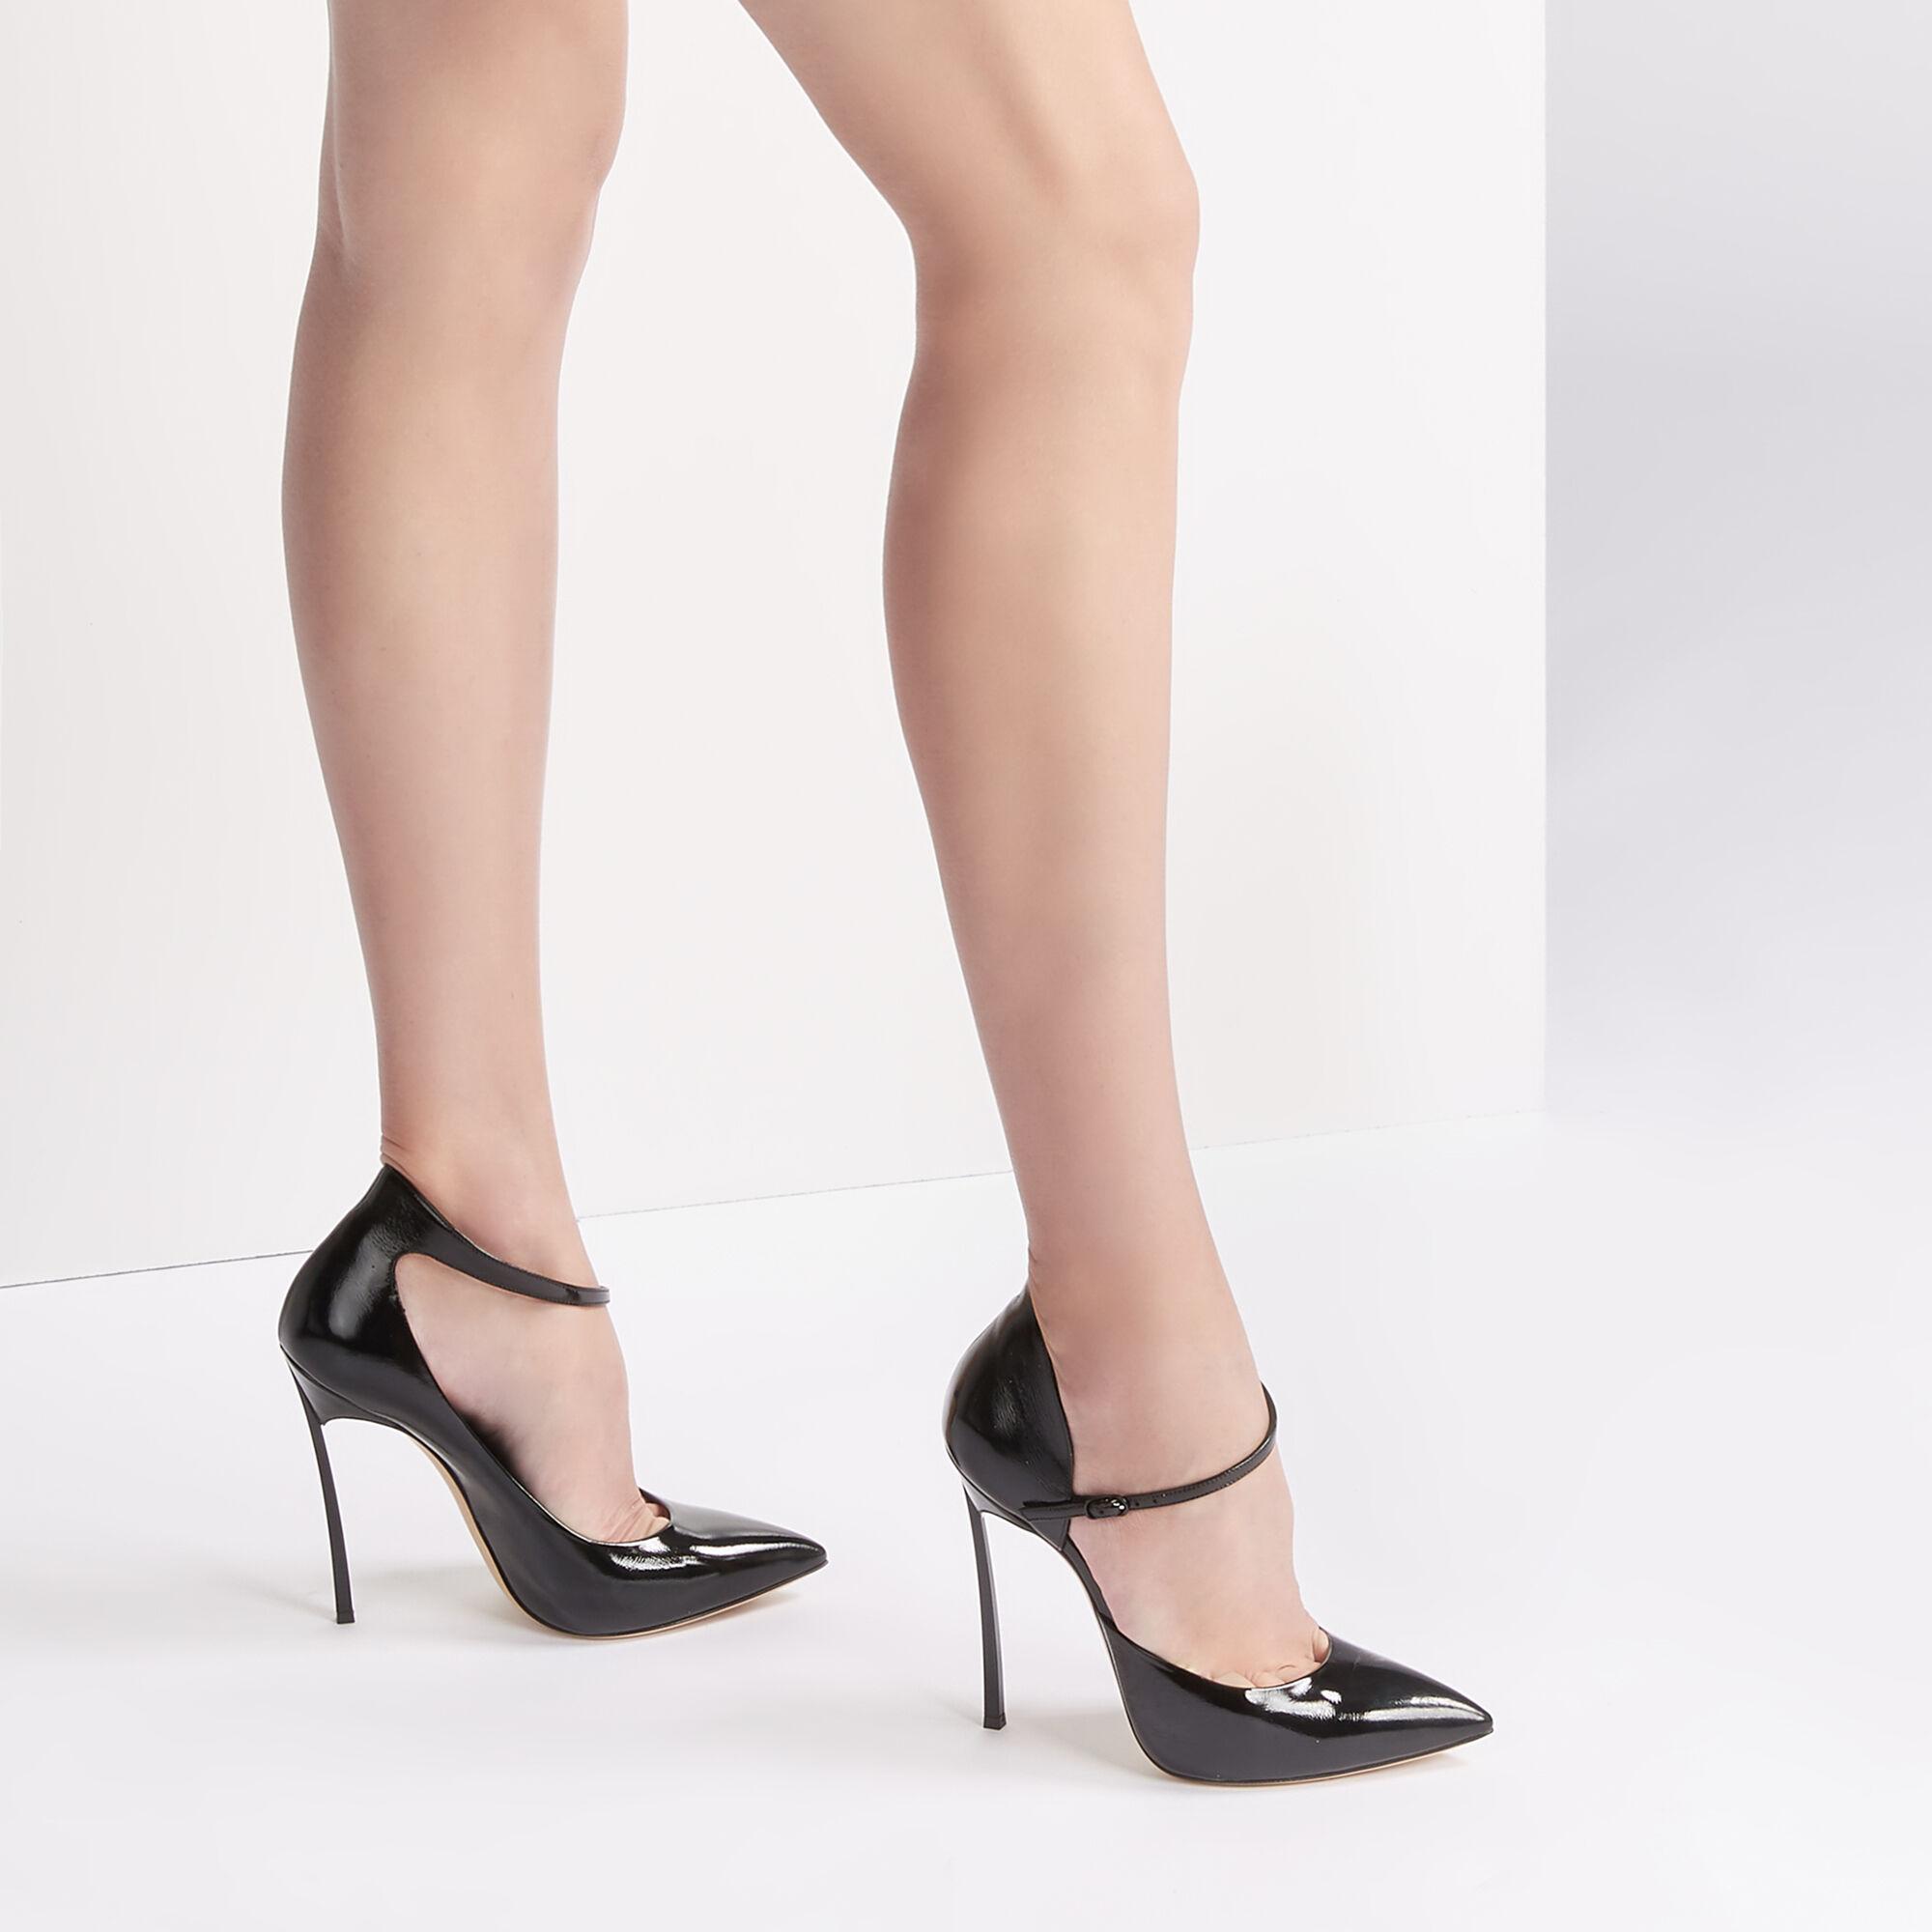 Casadei Designer Shoes | Casadei